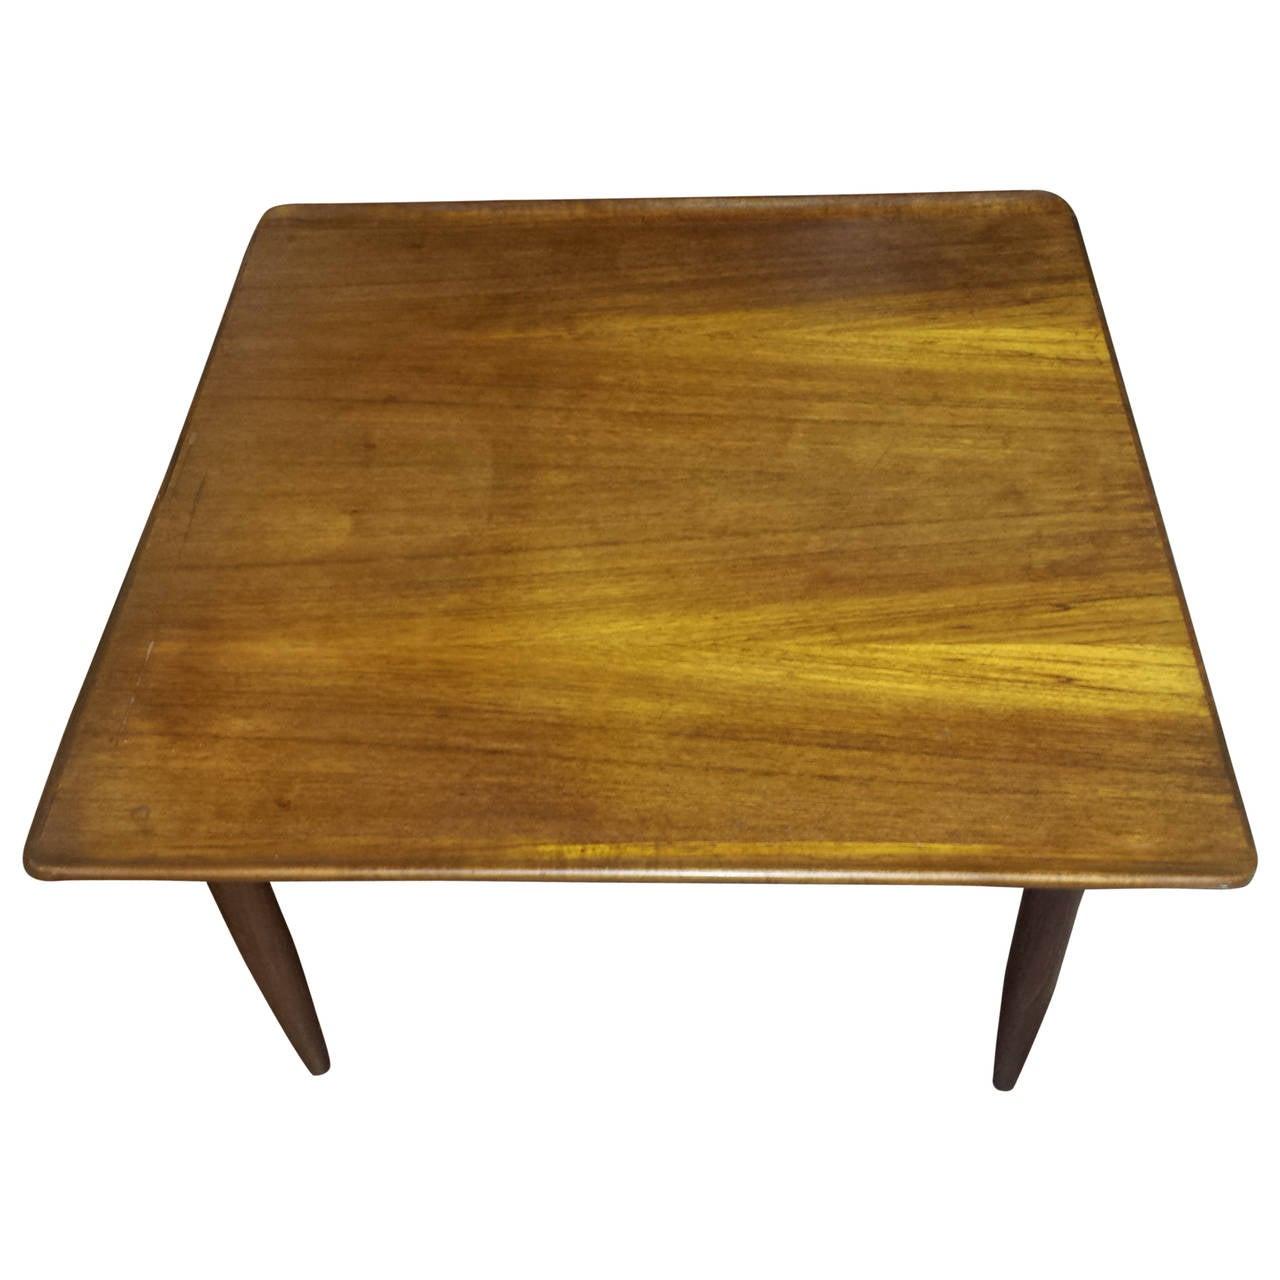 Mid Century Teak Square Coffee Table With Flip Edge At 1stdibs